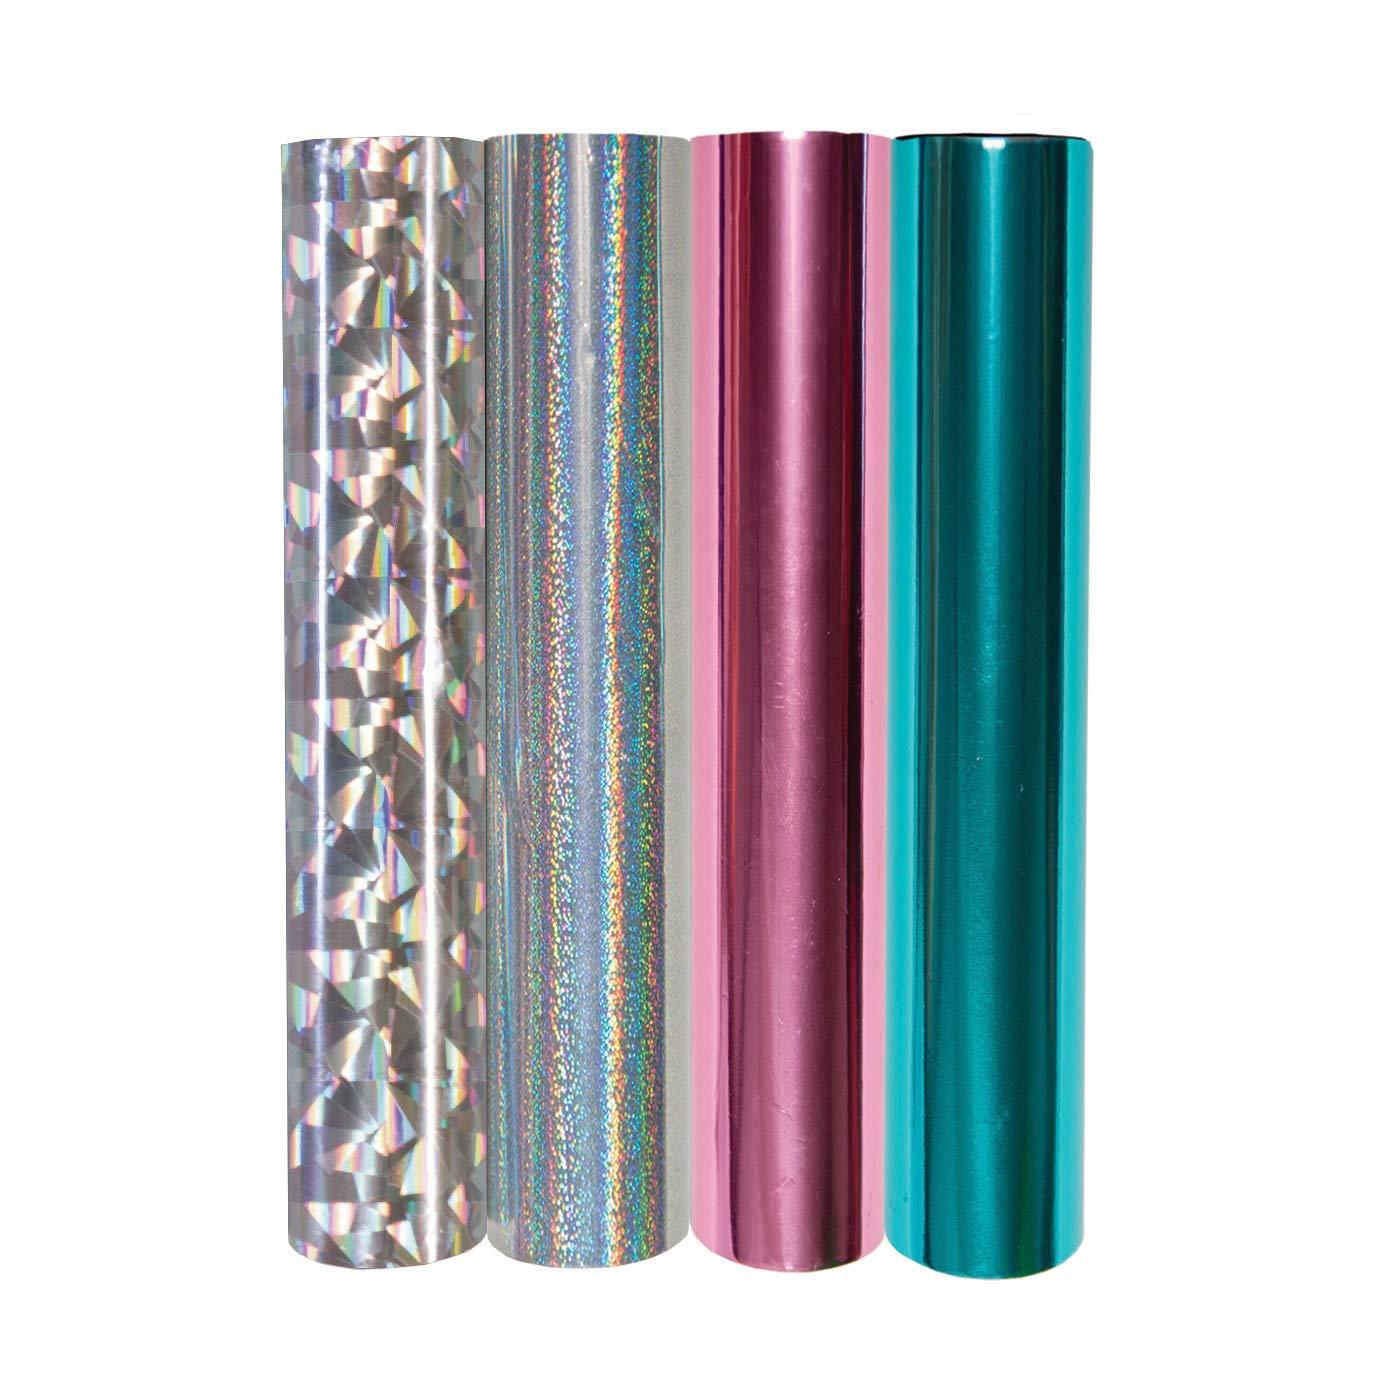 Spellbinders GLF-012 4 Metallic & Holographic Variety Pack Glimmer Hot Foil Roll, Multi